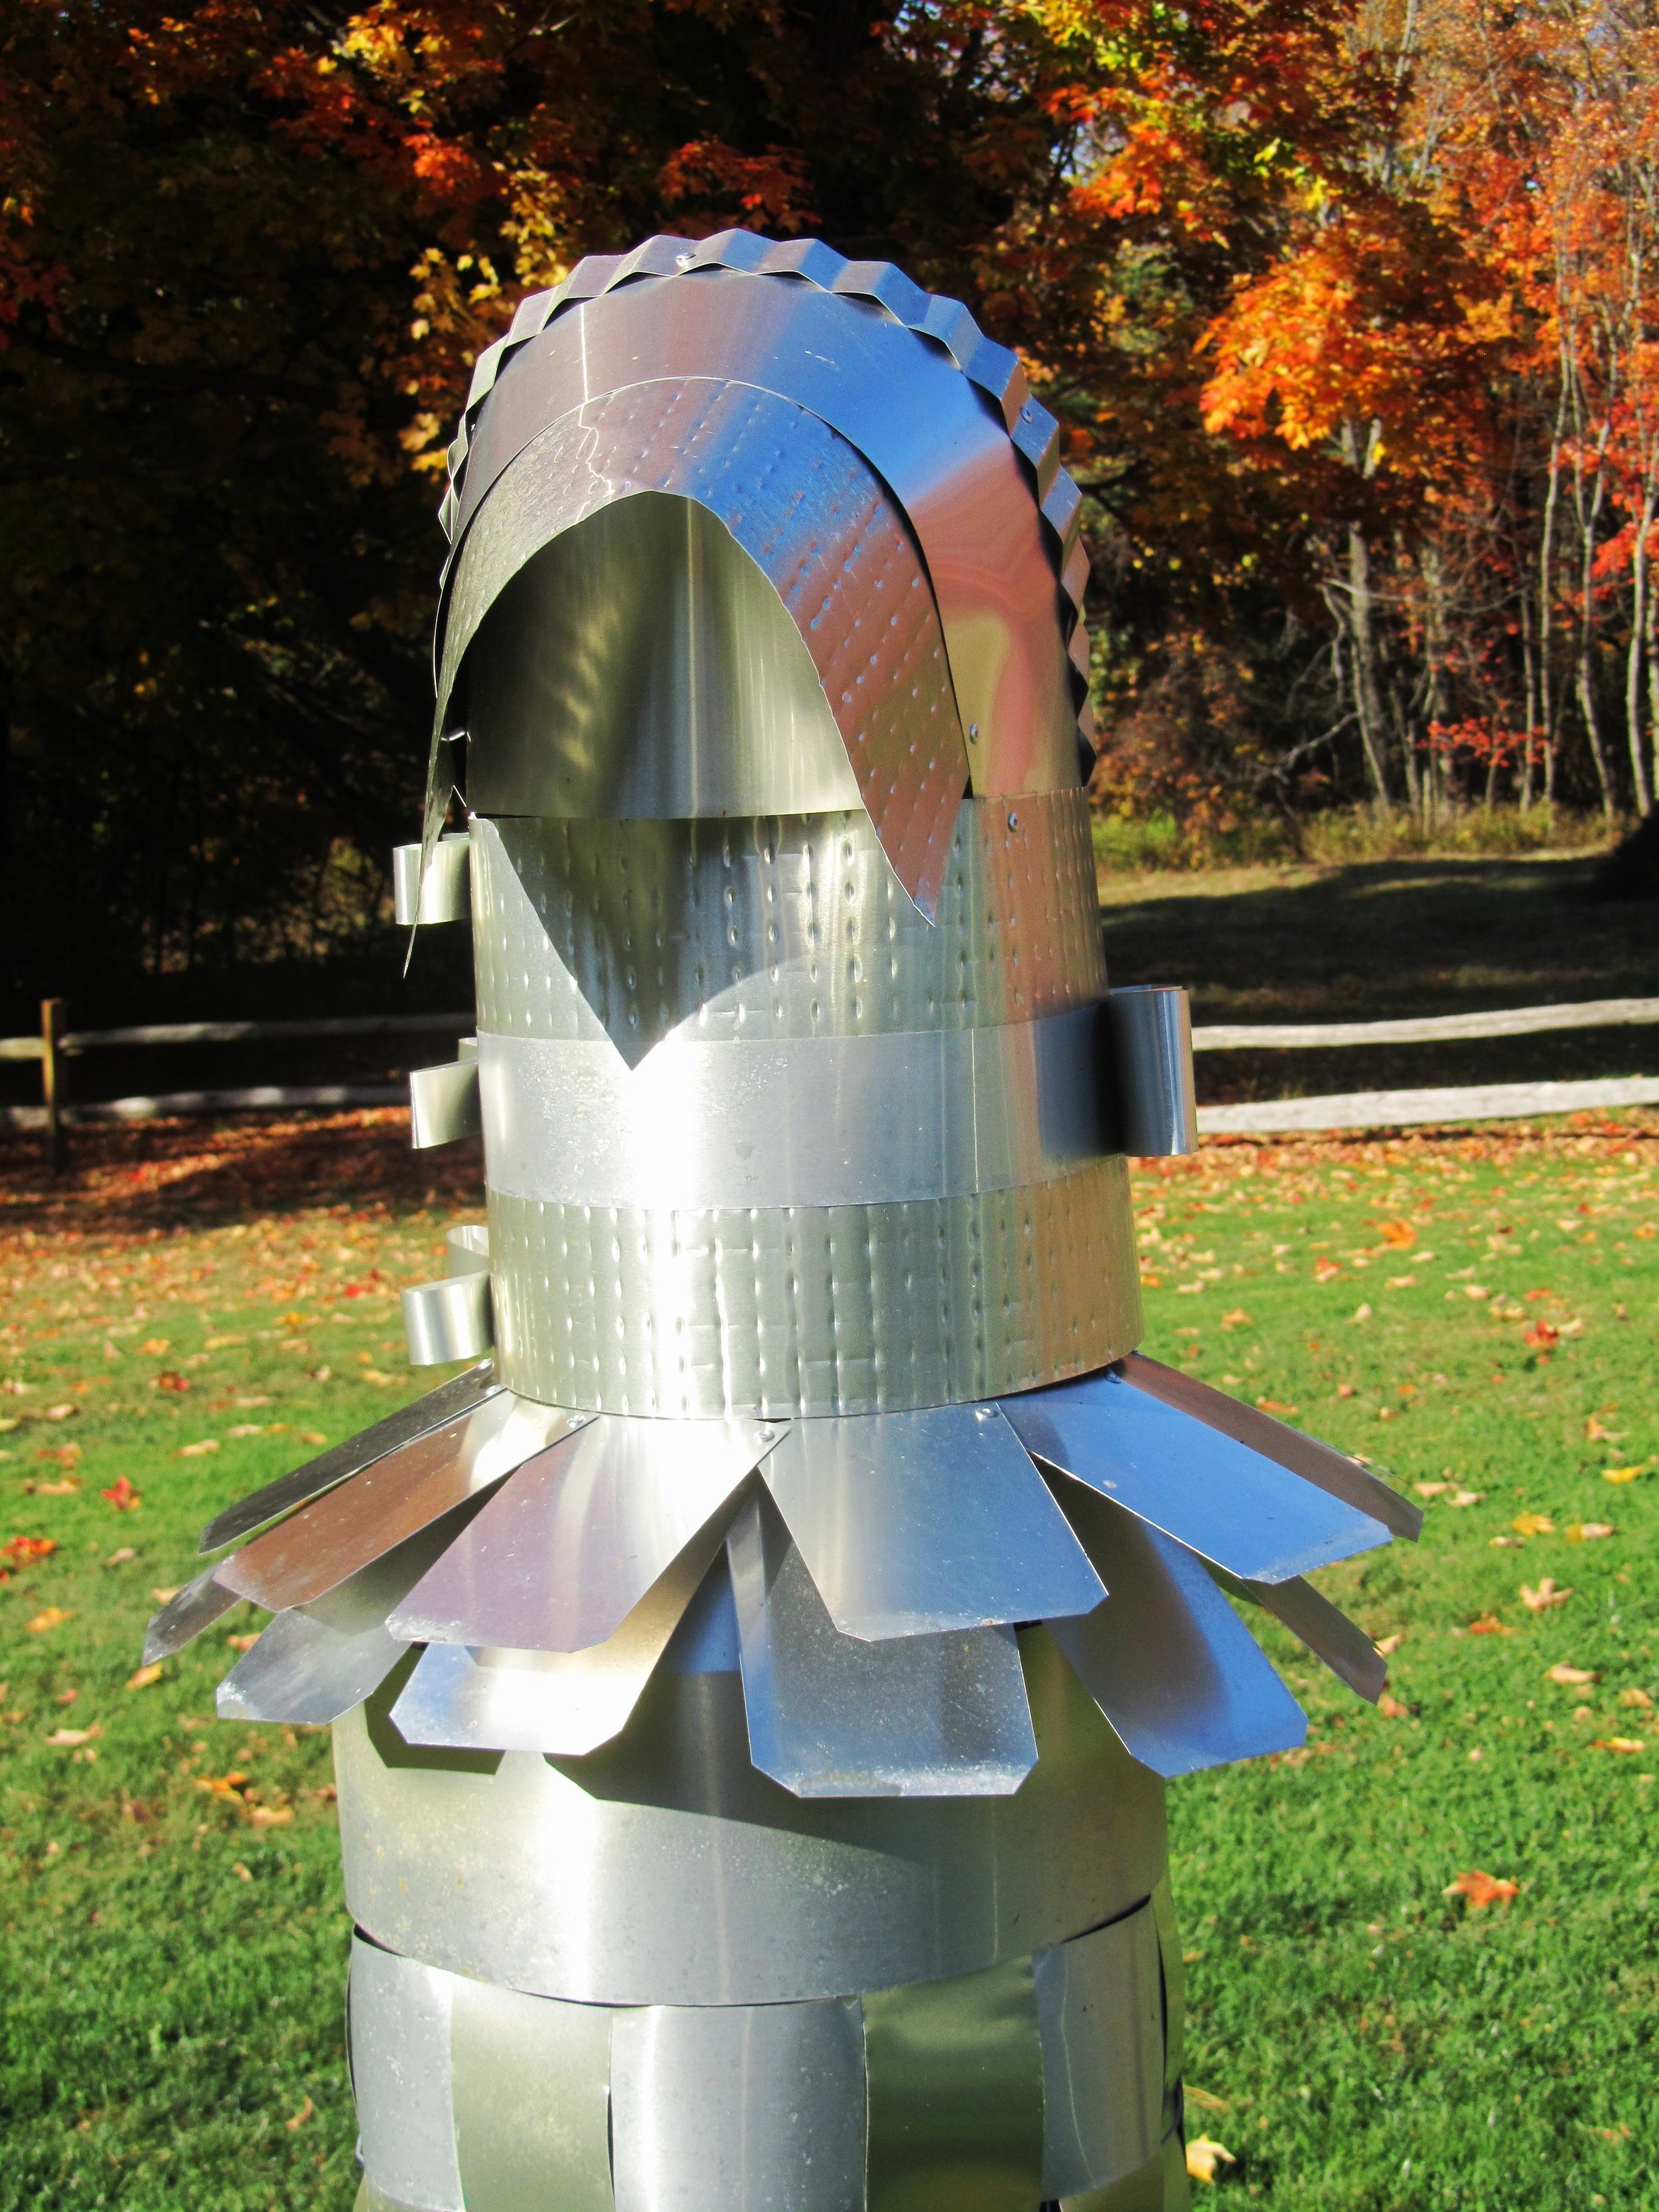 Armor Dresses III